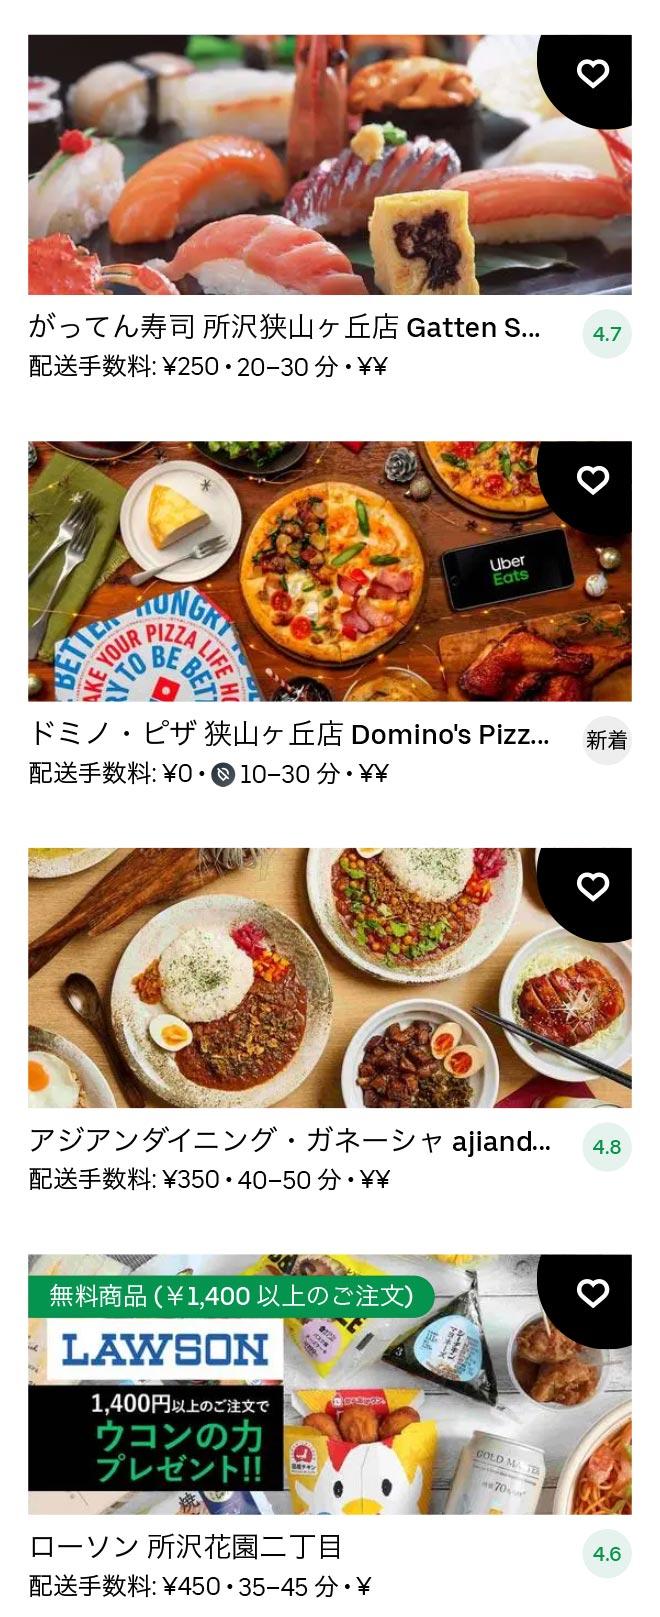 Musashi fujisawa menu 2101 08